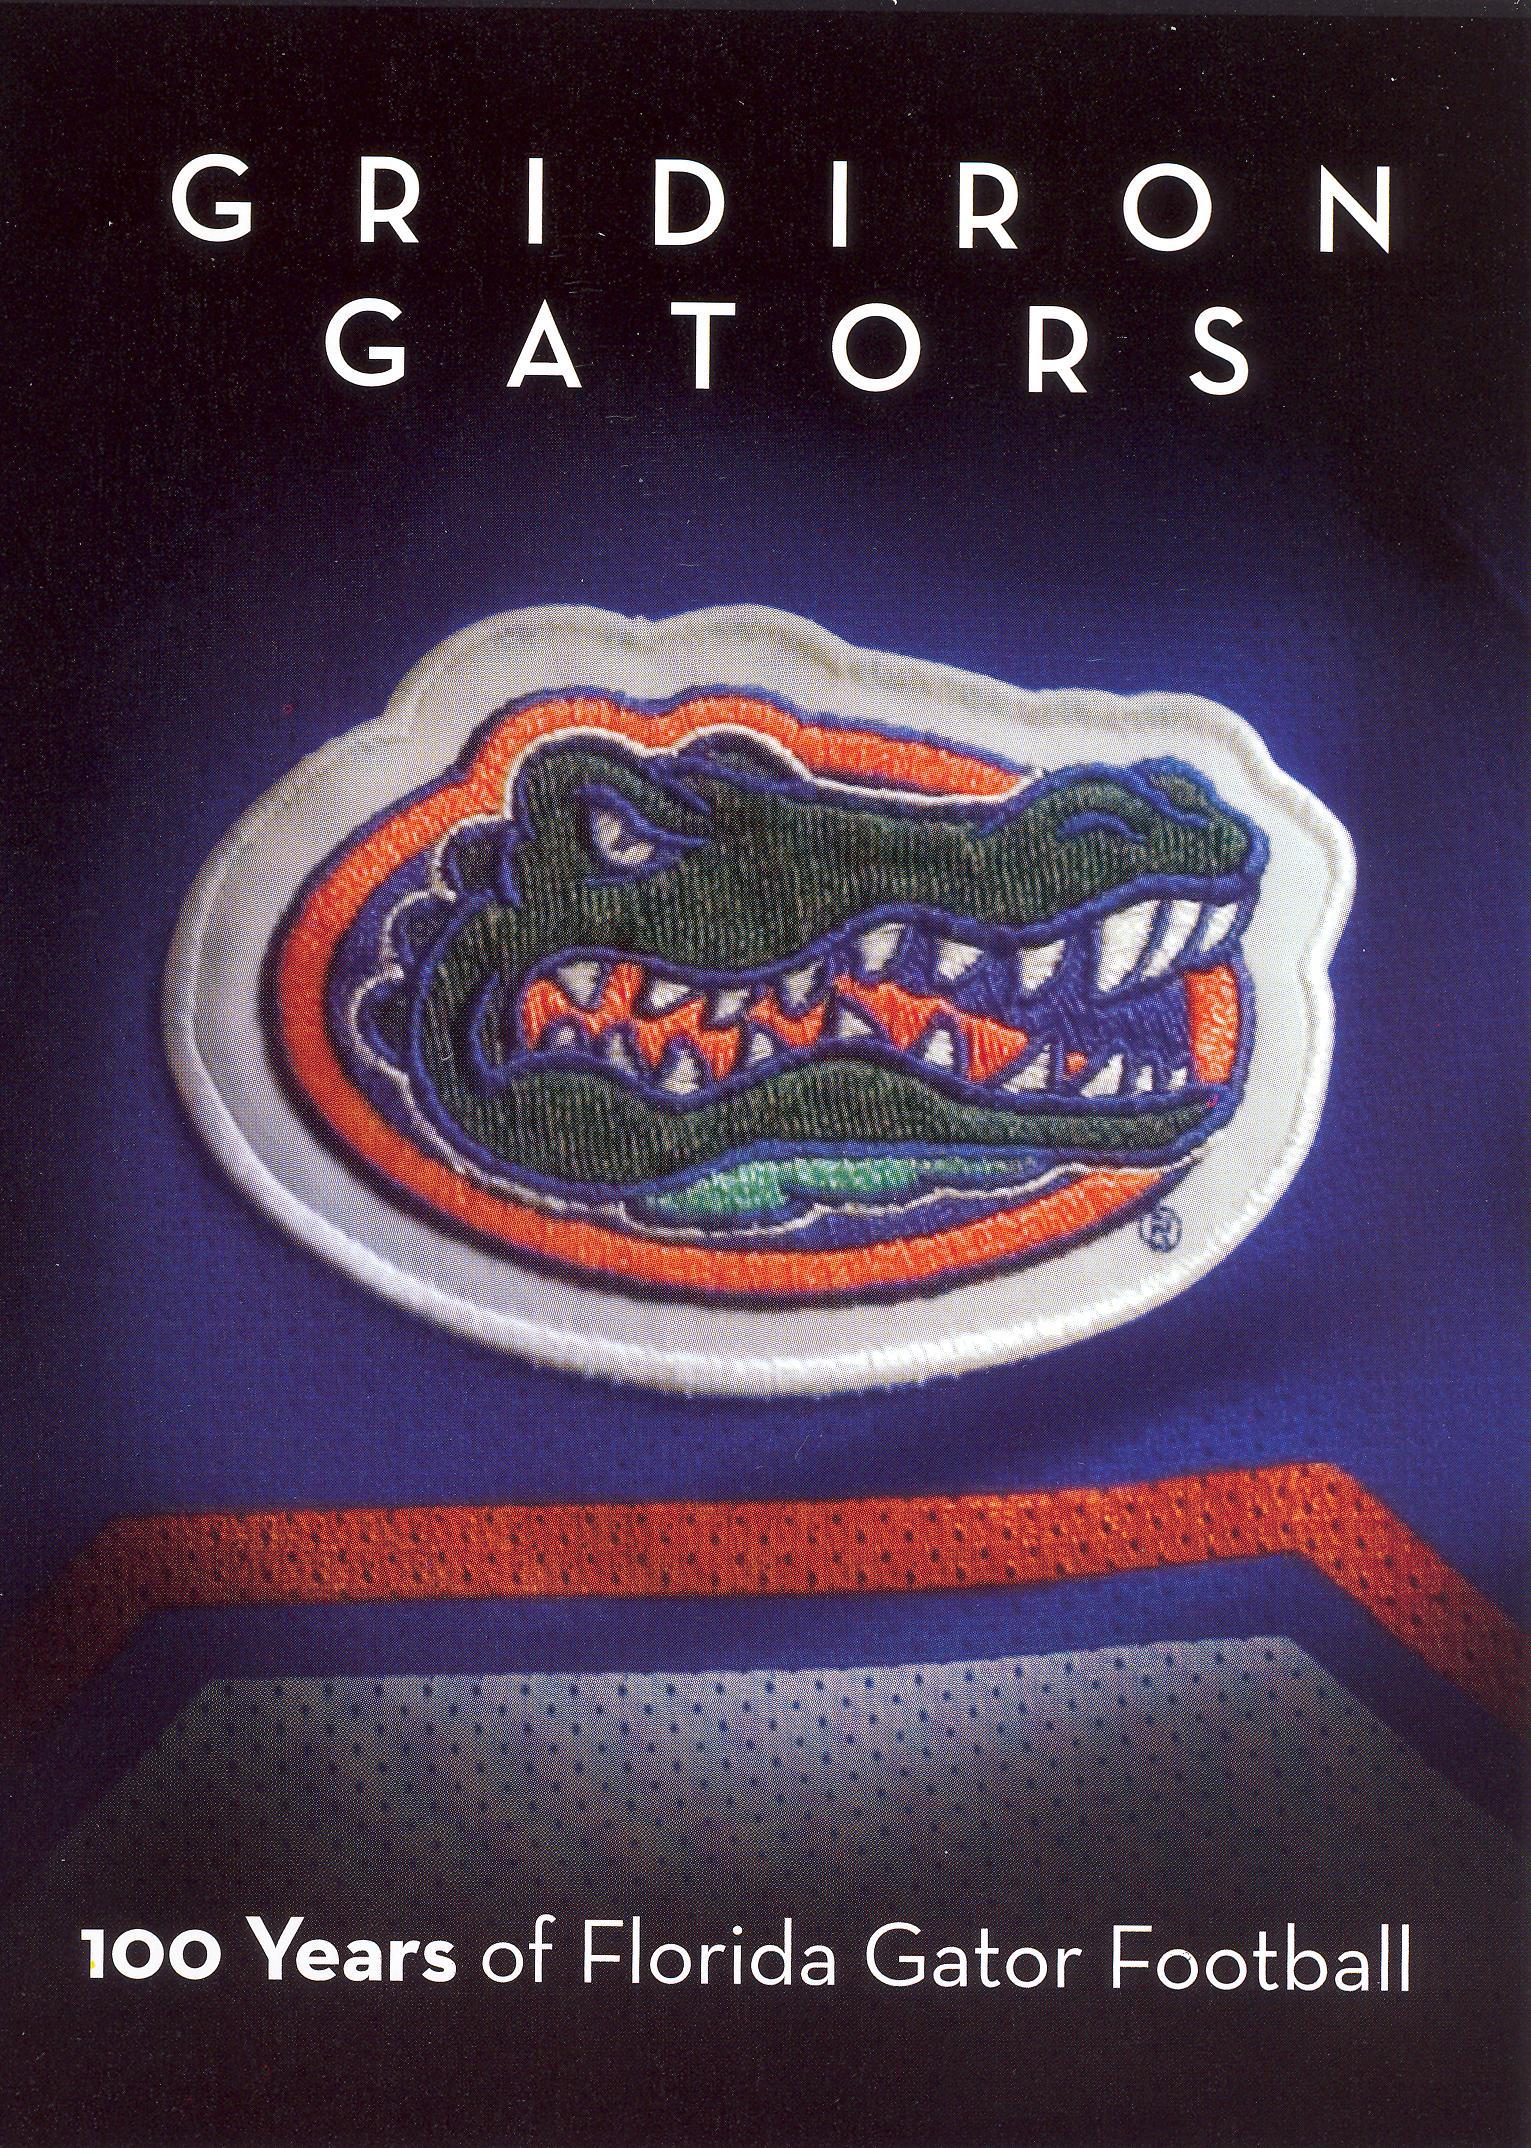 The History of Florida Gator Football